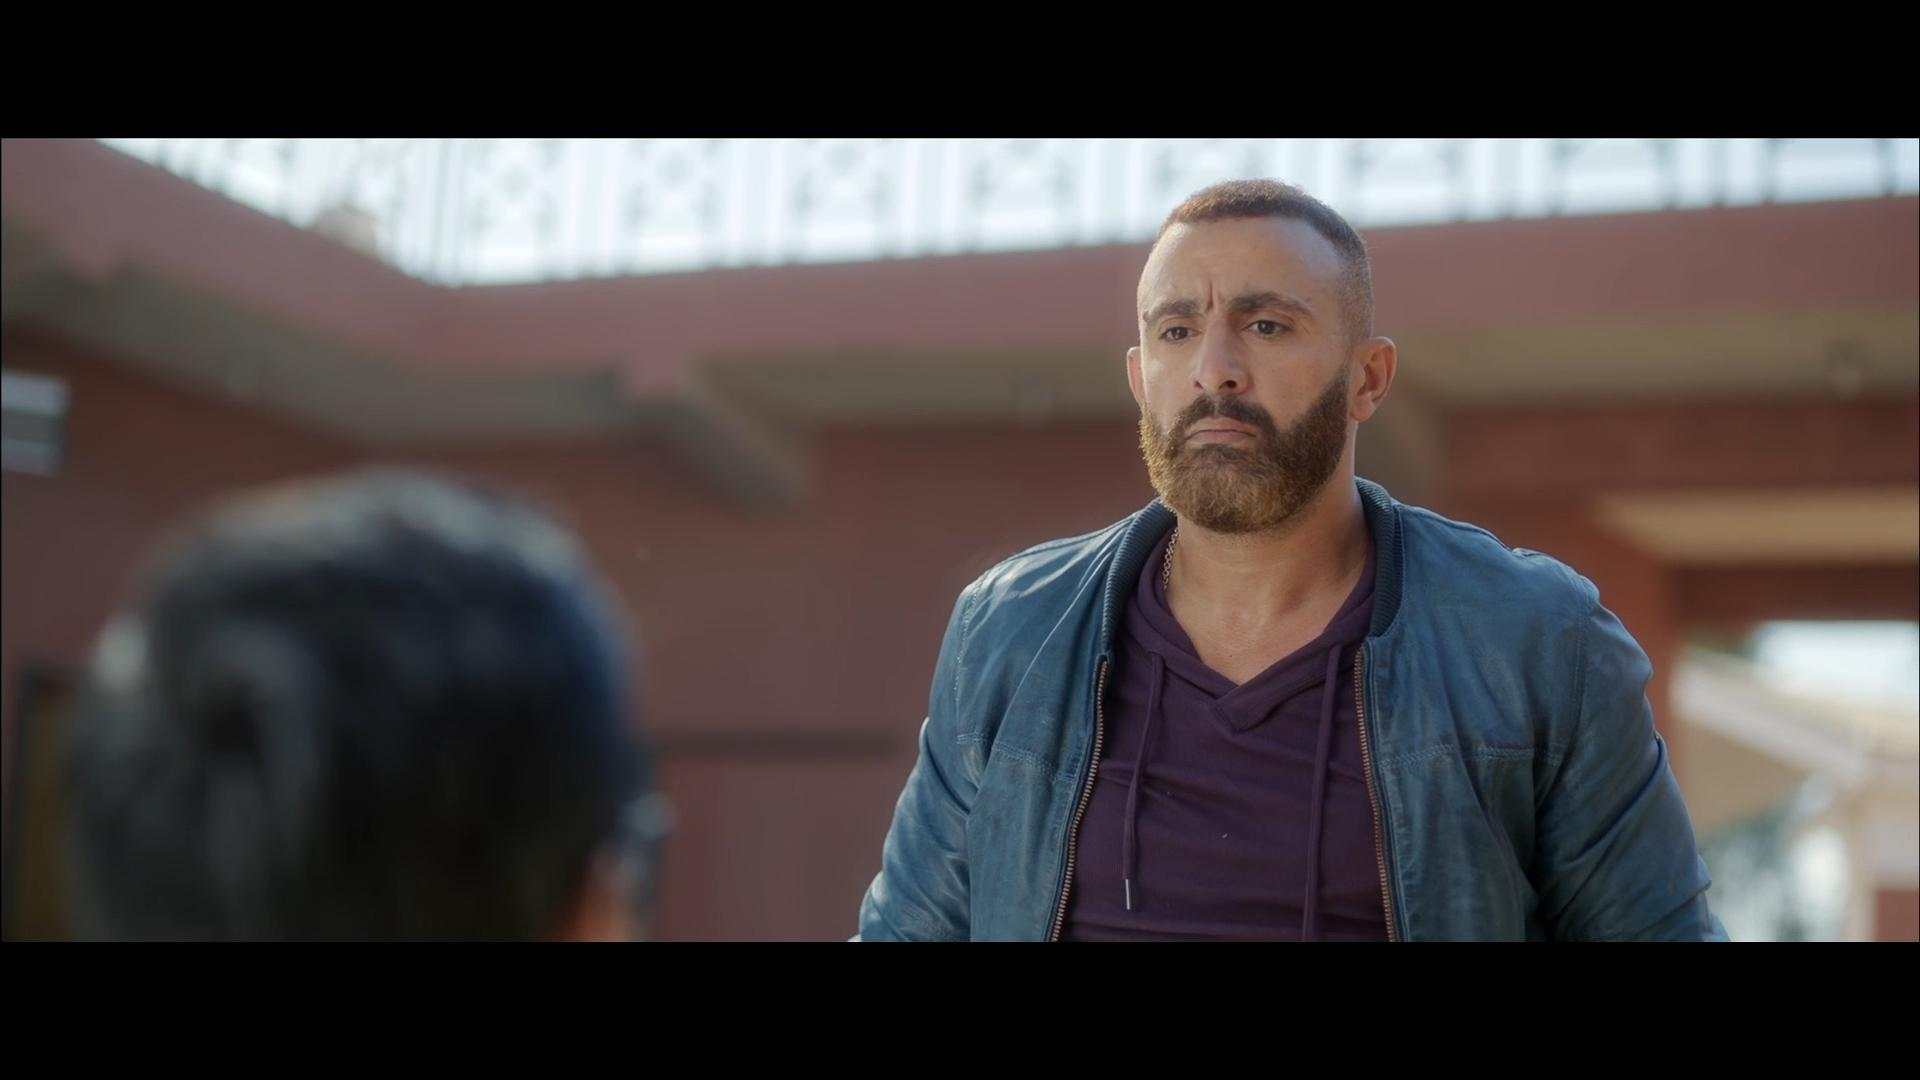 [فيلم][تورنت][تحميل][هروب اضطراري][2017][1080p][Web-DL] 14 arabp2p.com